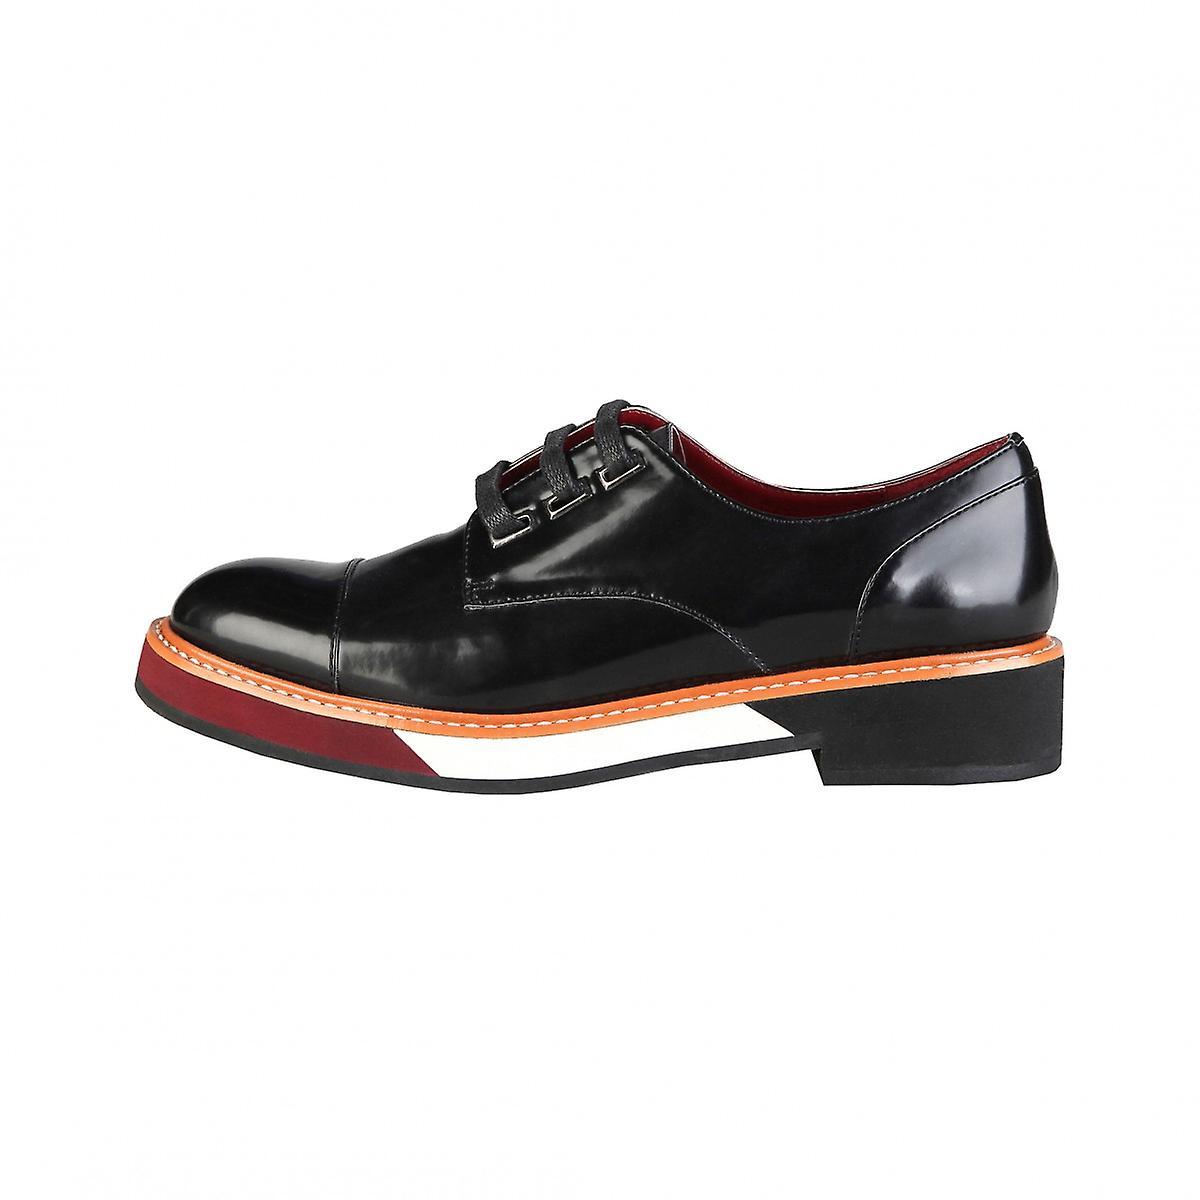 Ana Lublin chaussures stringate noir CATHARINA  Autunno Inverno